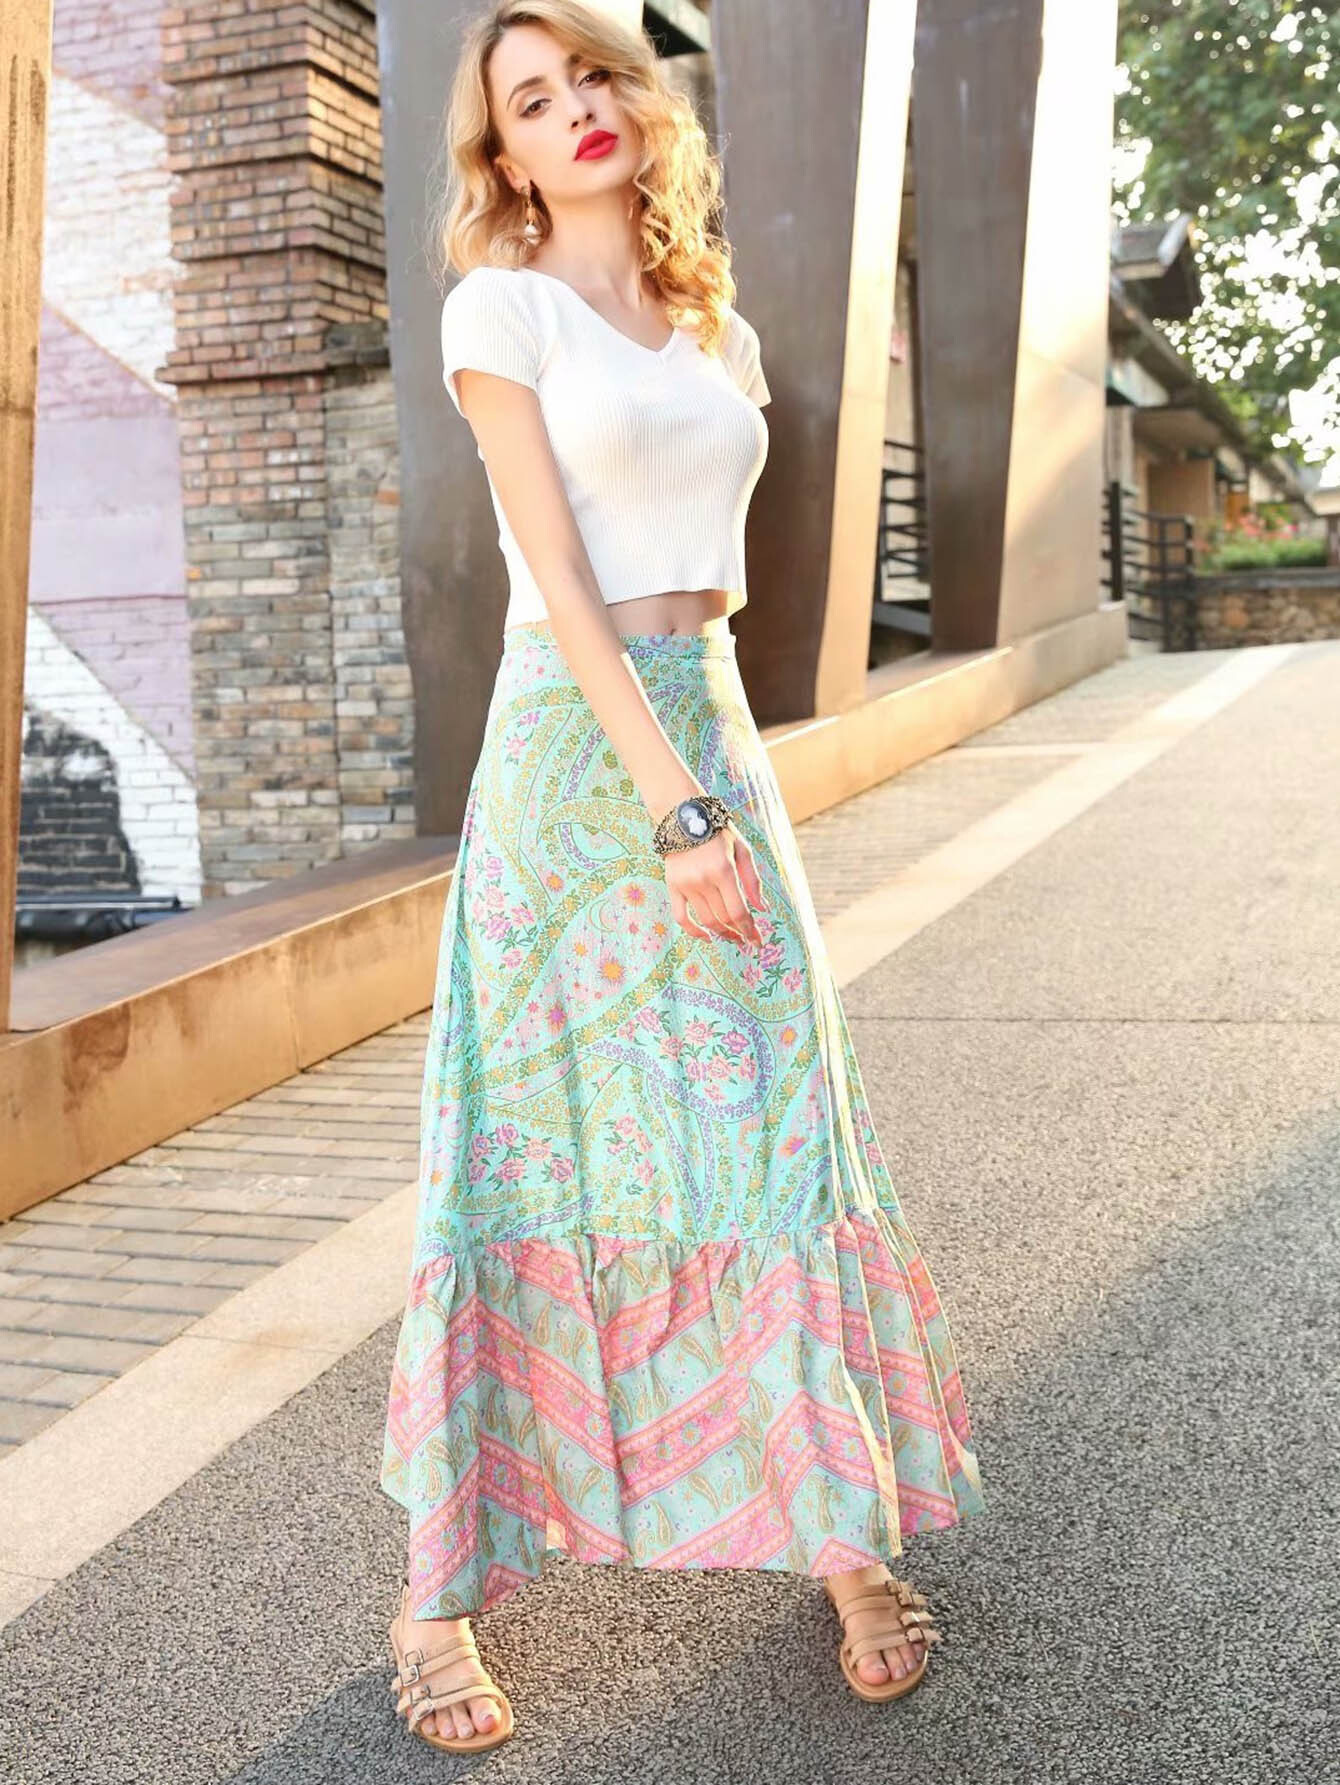 Calico Print Ruffle Hem Skirt tied v back ruffle hem calico top